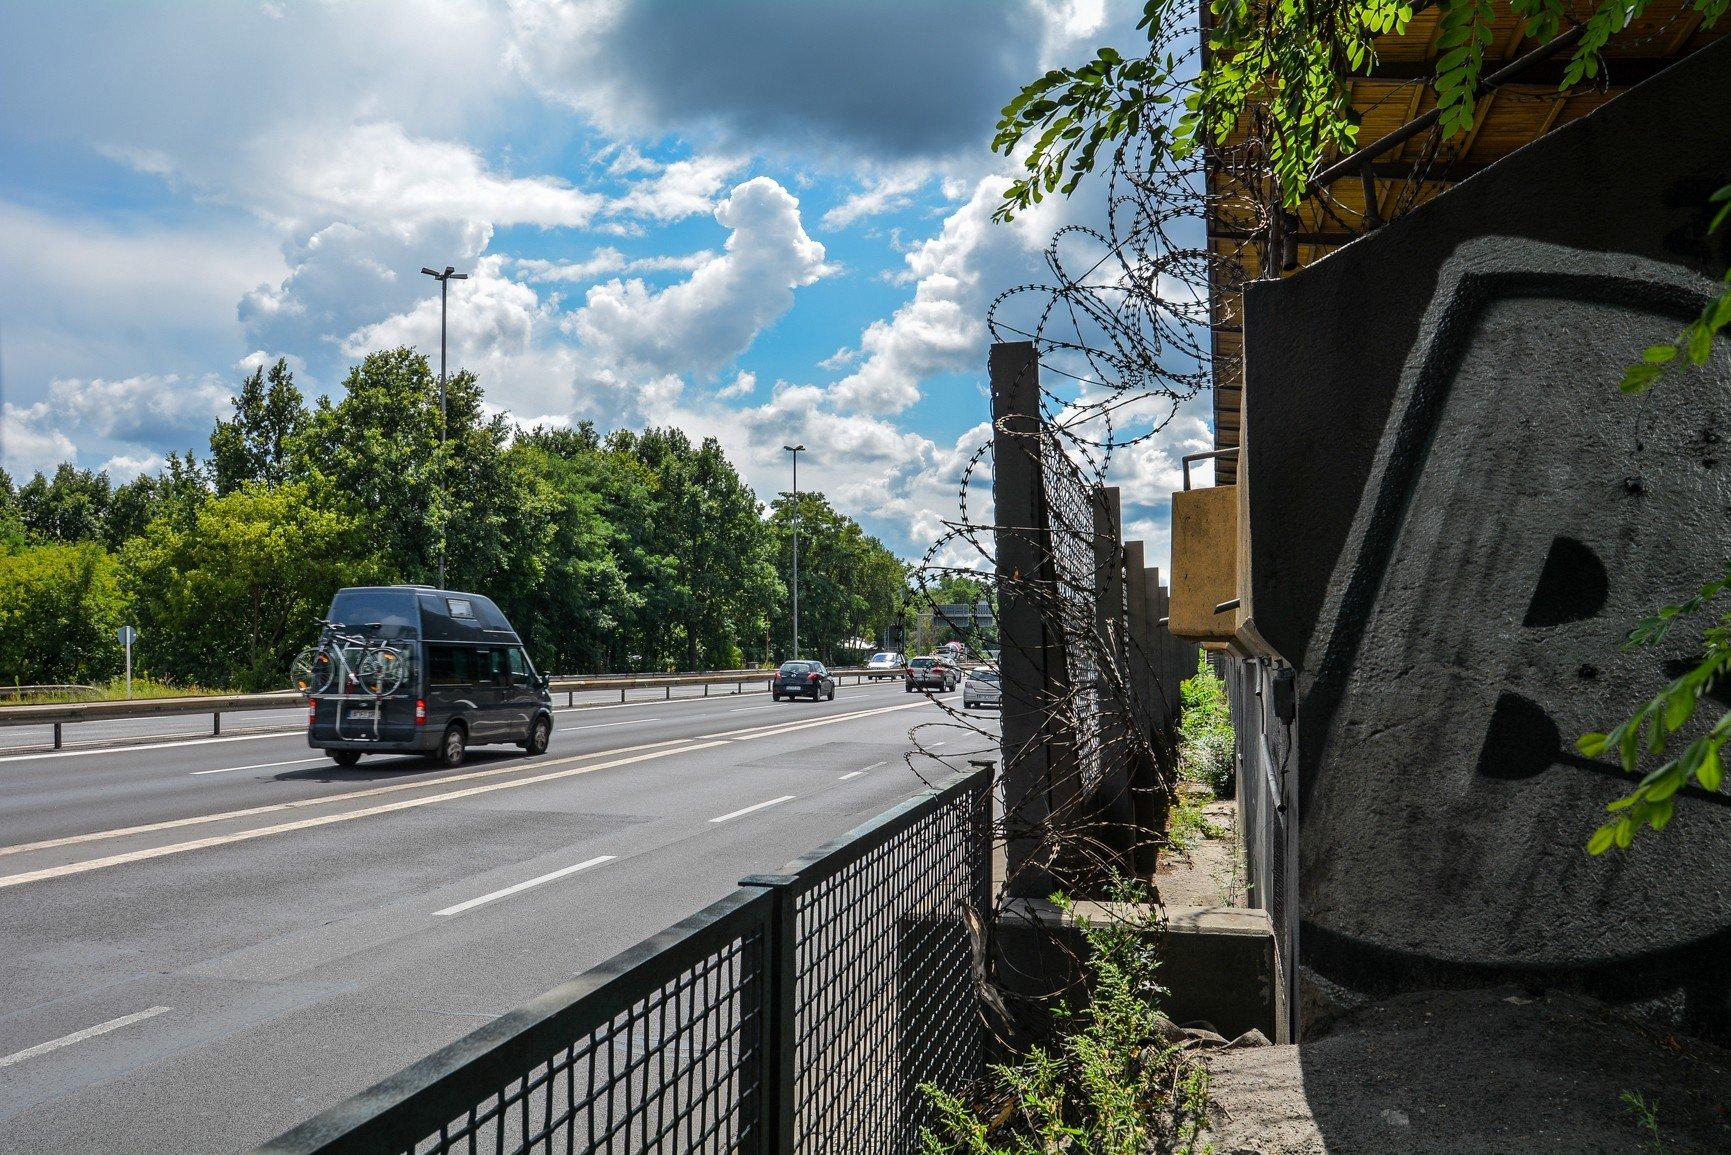 autobahn avus tribüne lost places abandoned berlin urbex germany